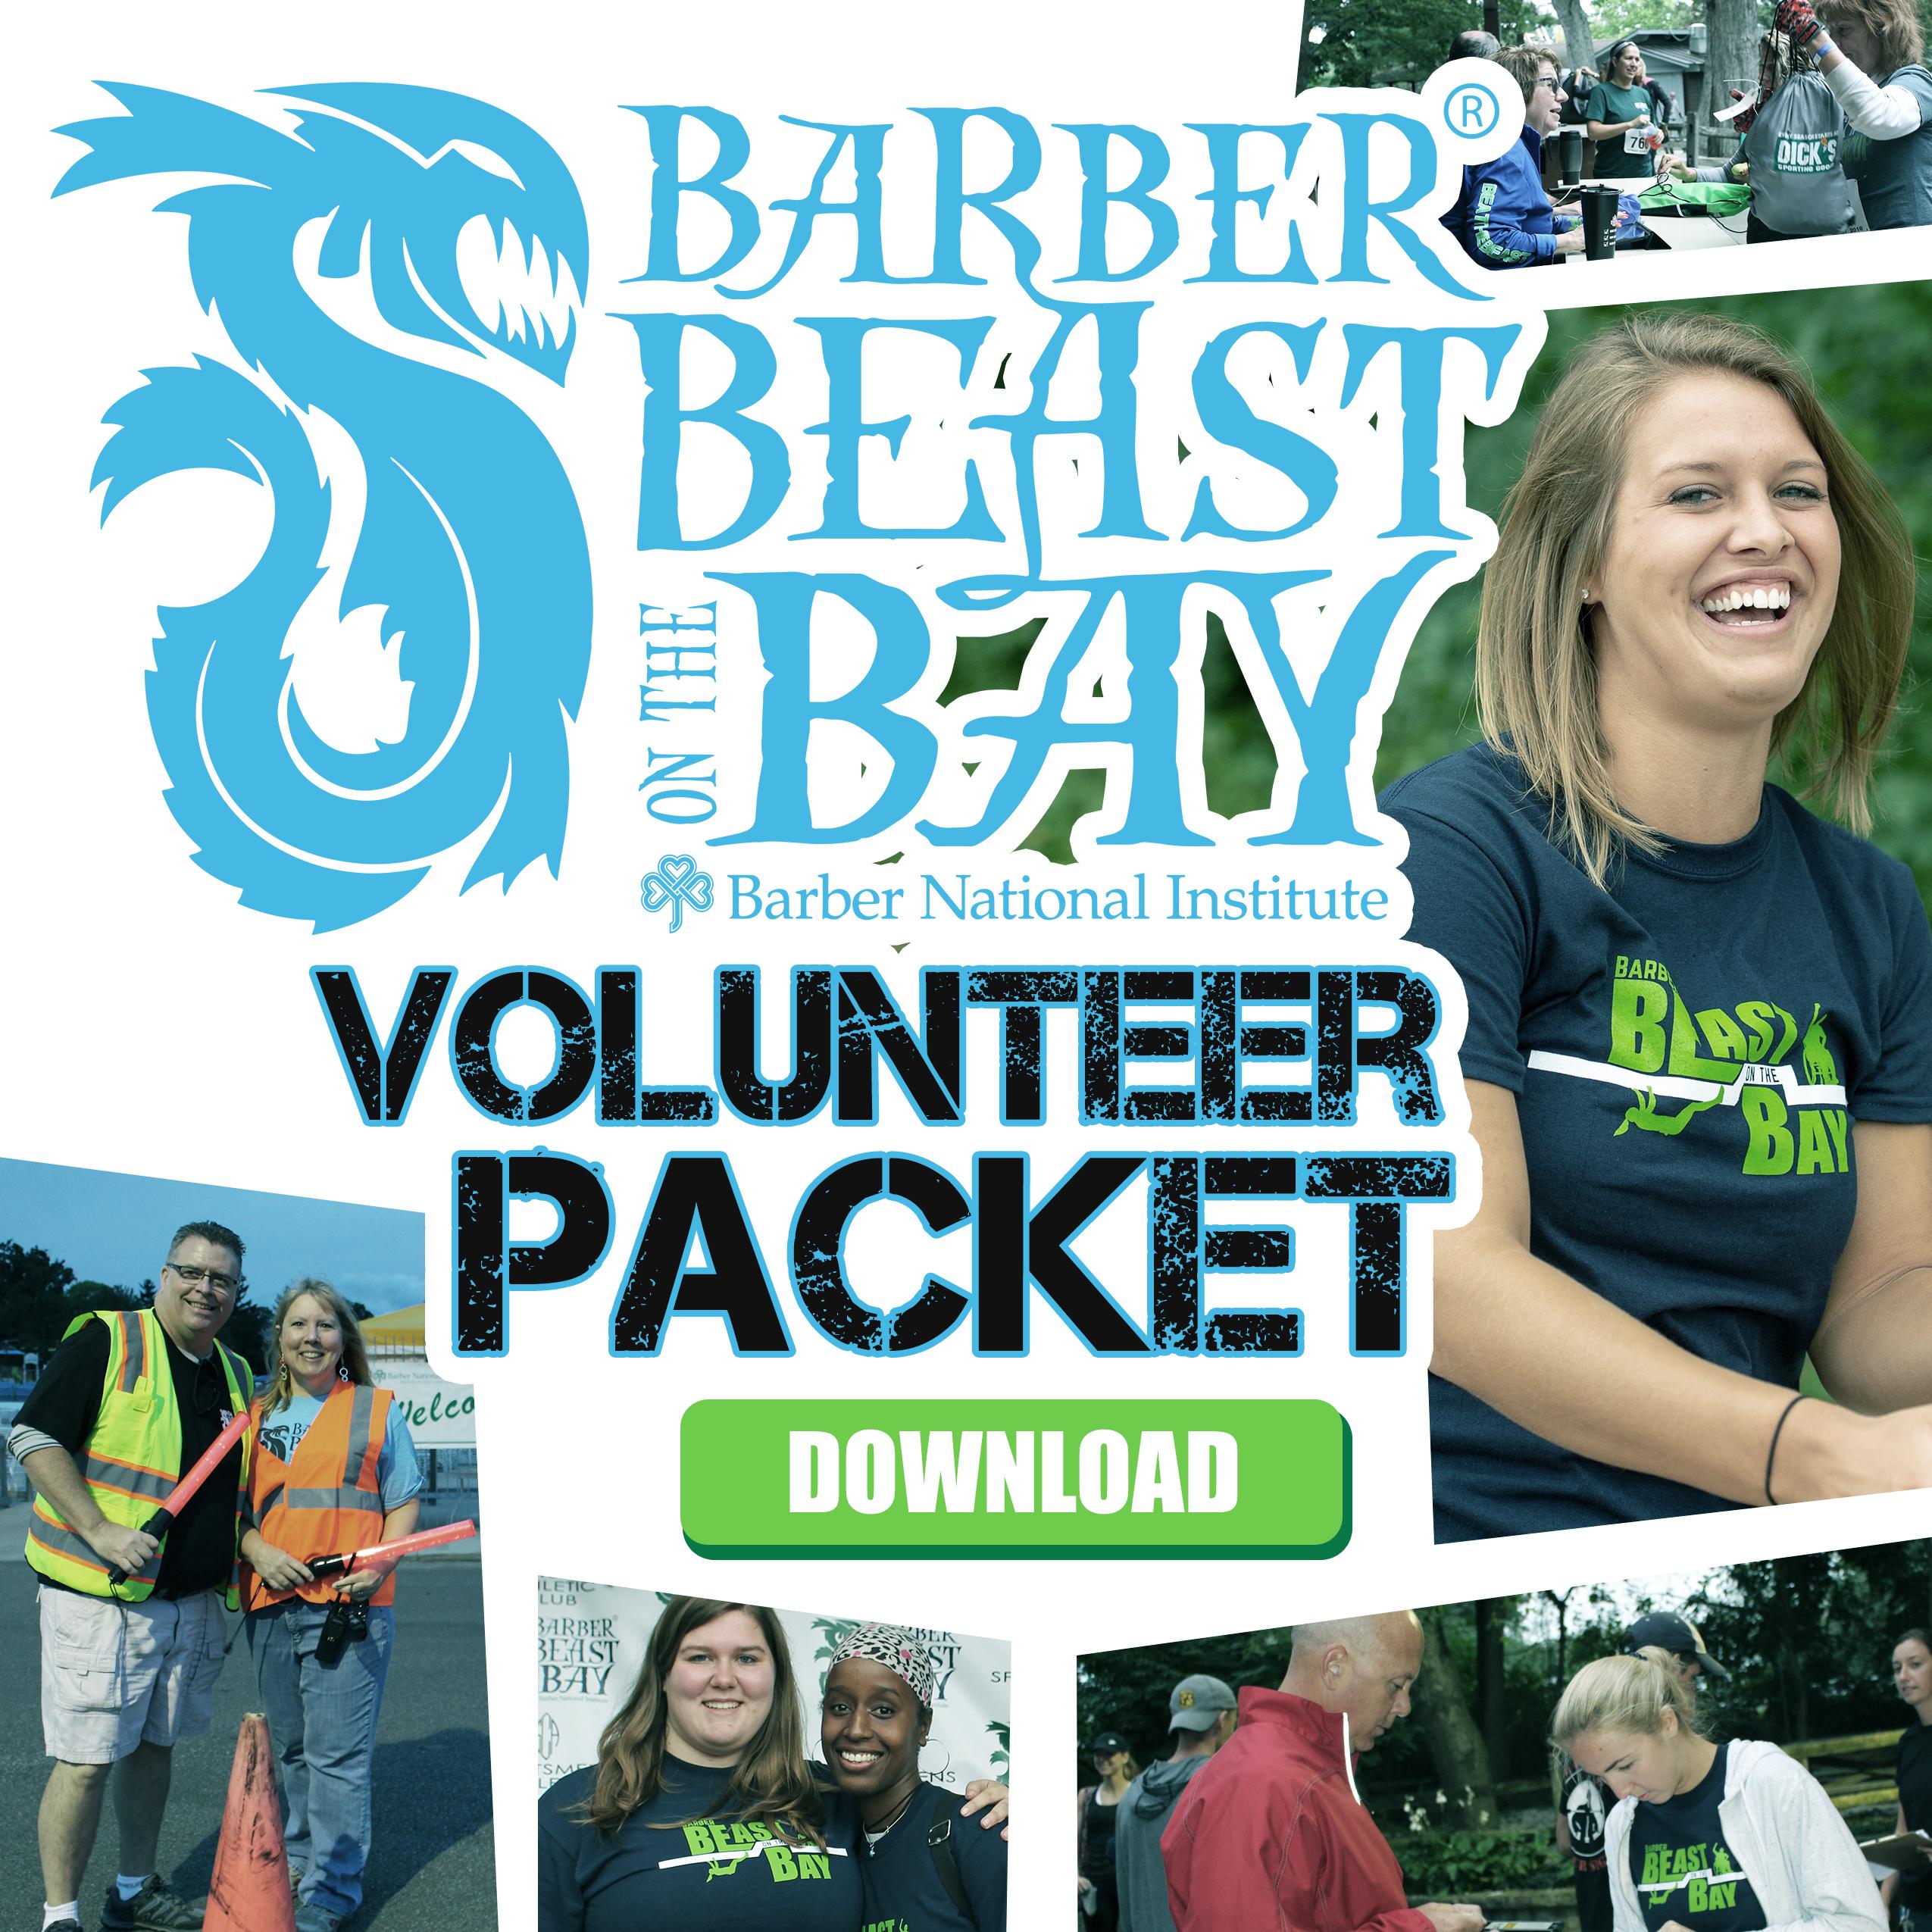 Volunteer Packet Button.jpg